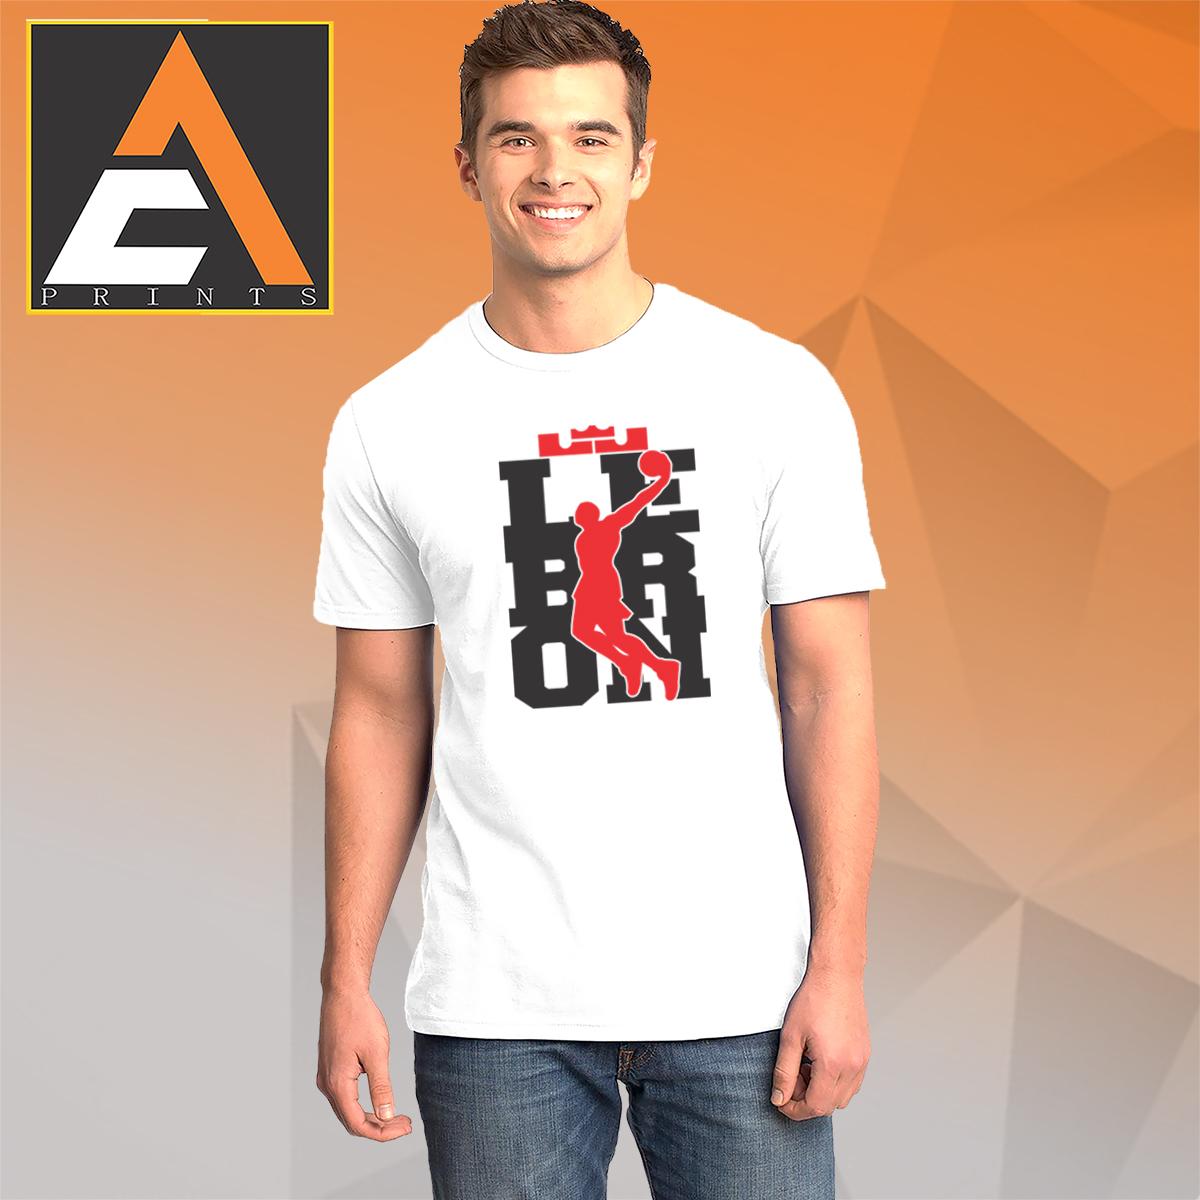 lowest price bca84 1c425 LEBRON JAMES t shirt Basketball tshirt Basketball shirt Shirt  Unisex(Men/Women)(Male/Female)(Gildan) T-shirts Tees T shirts Tshirts ...